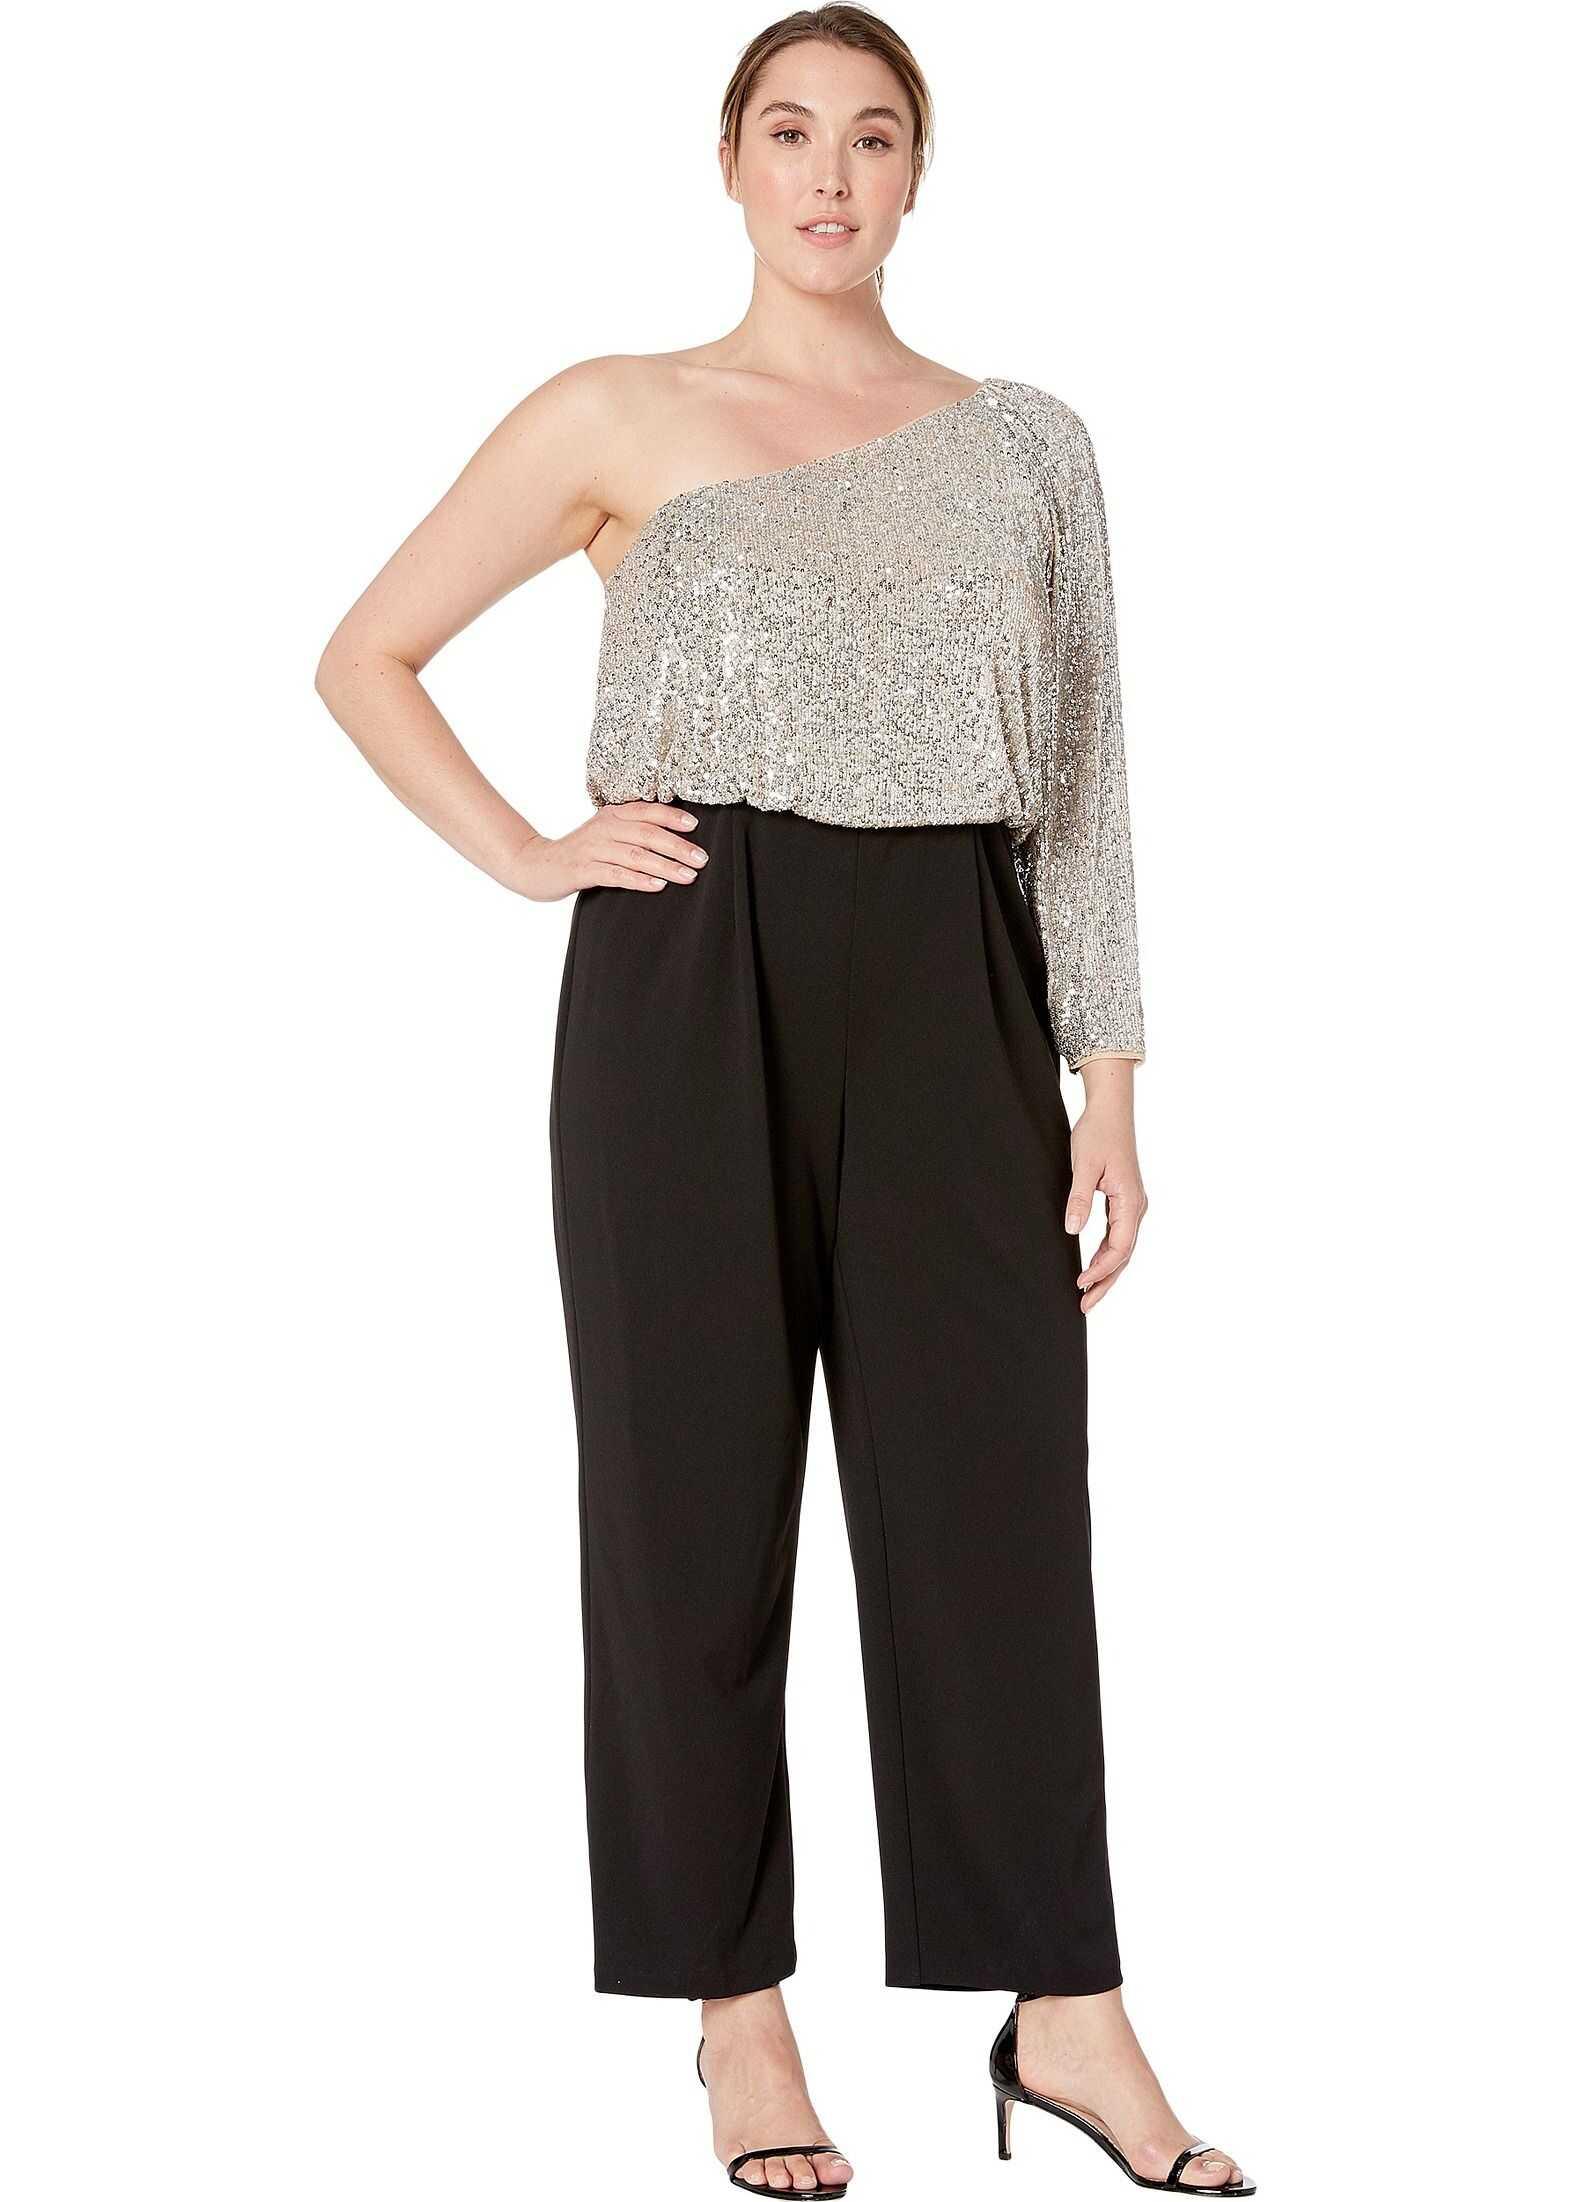 Adrianna Papell Plus Size One Shoulder Sequin Jumpsuit Silver/Black